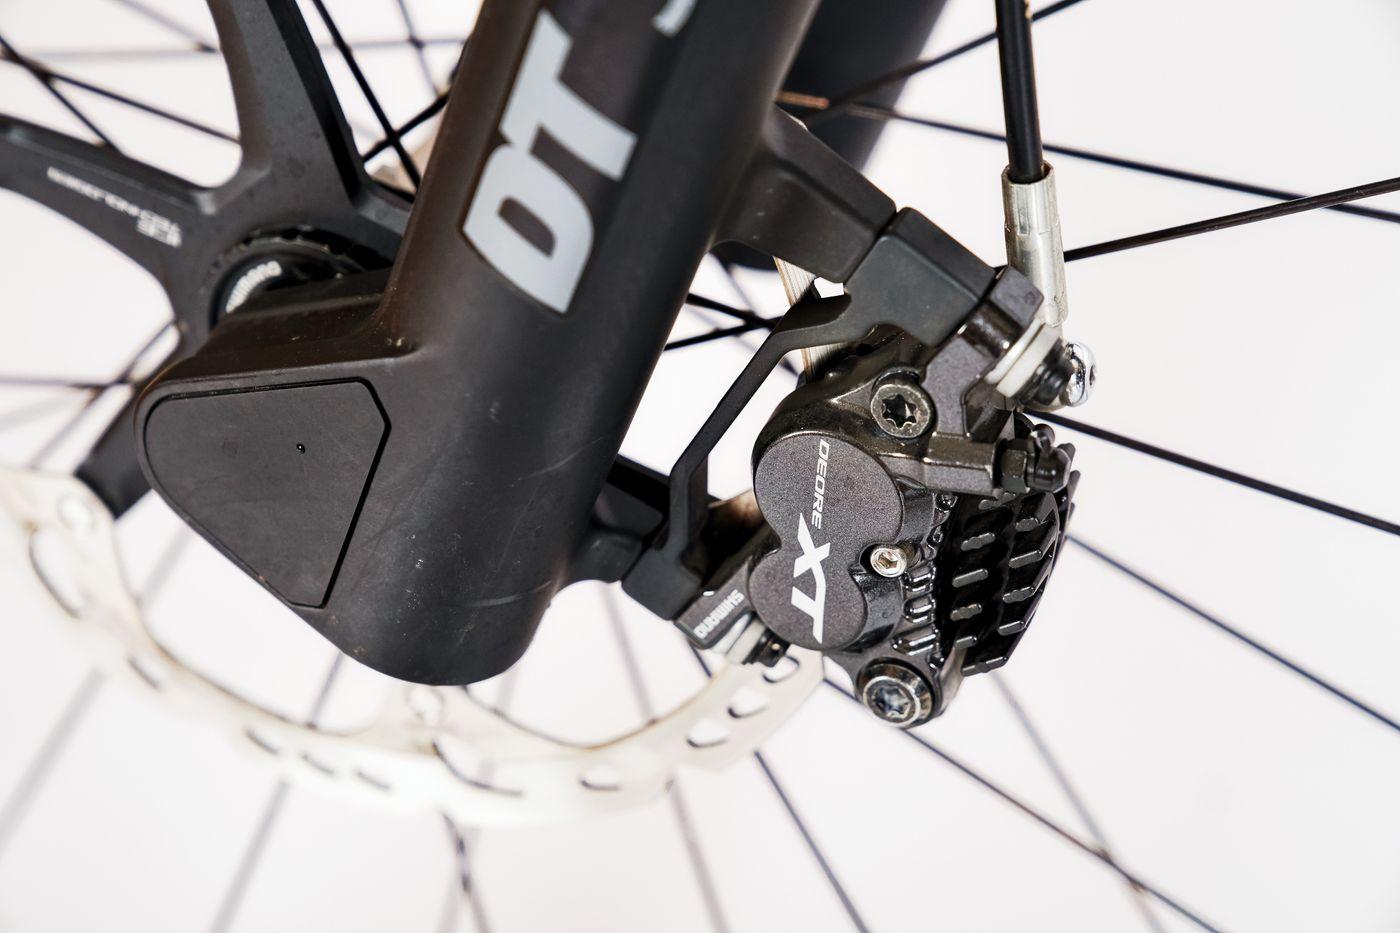 Bixs Sign ClimBer-e - Shimano XT BR-M8020